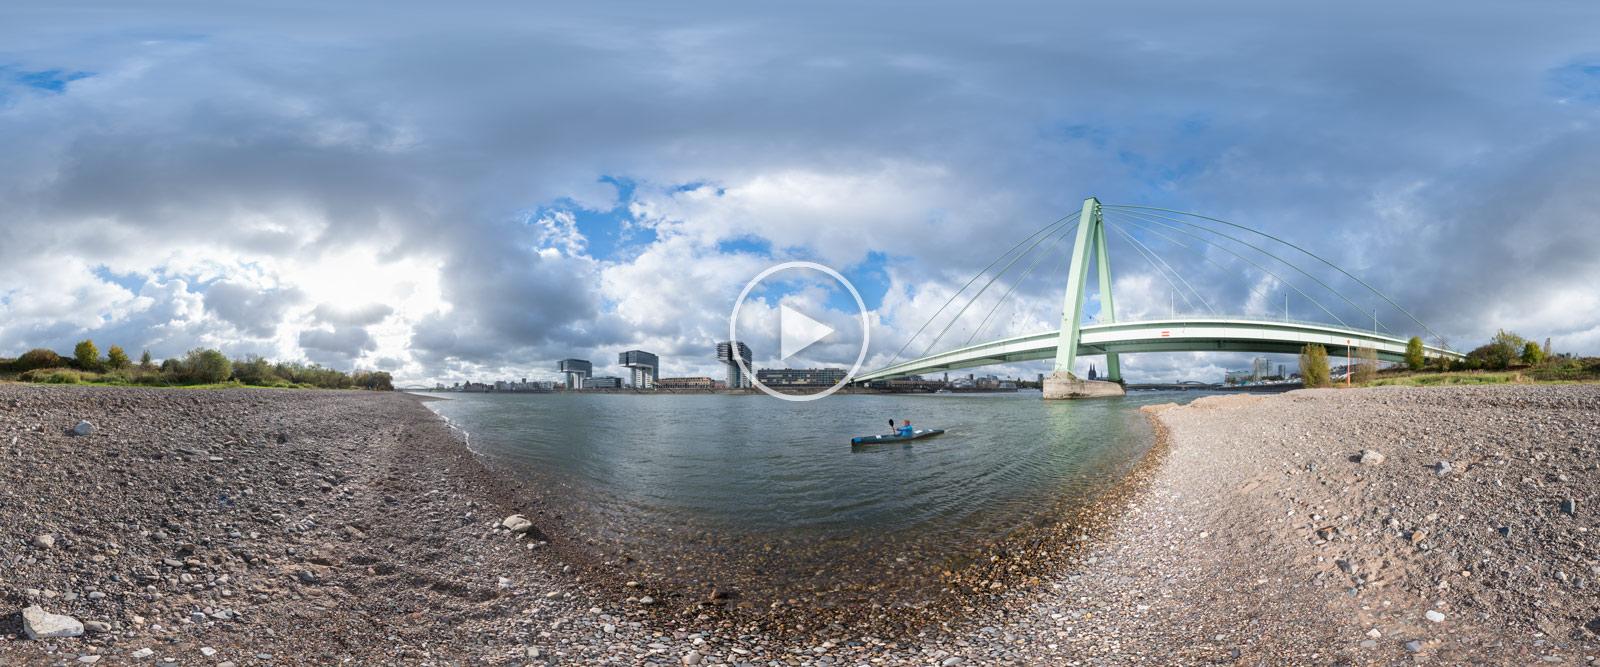 Rheinkilometer 687,2 | 360°x180°-Panoramafotografie von Chris Witzani